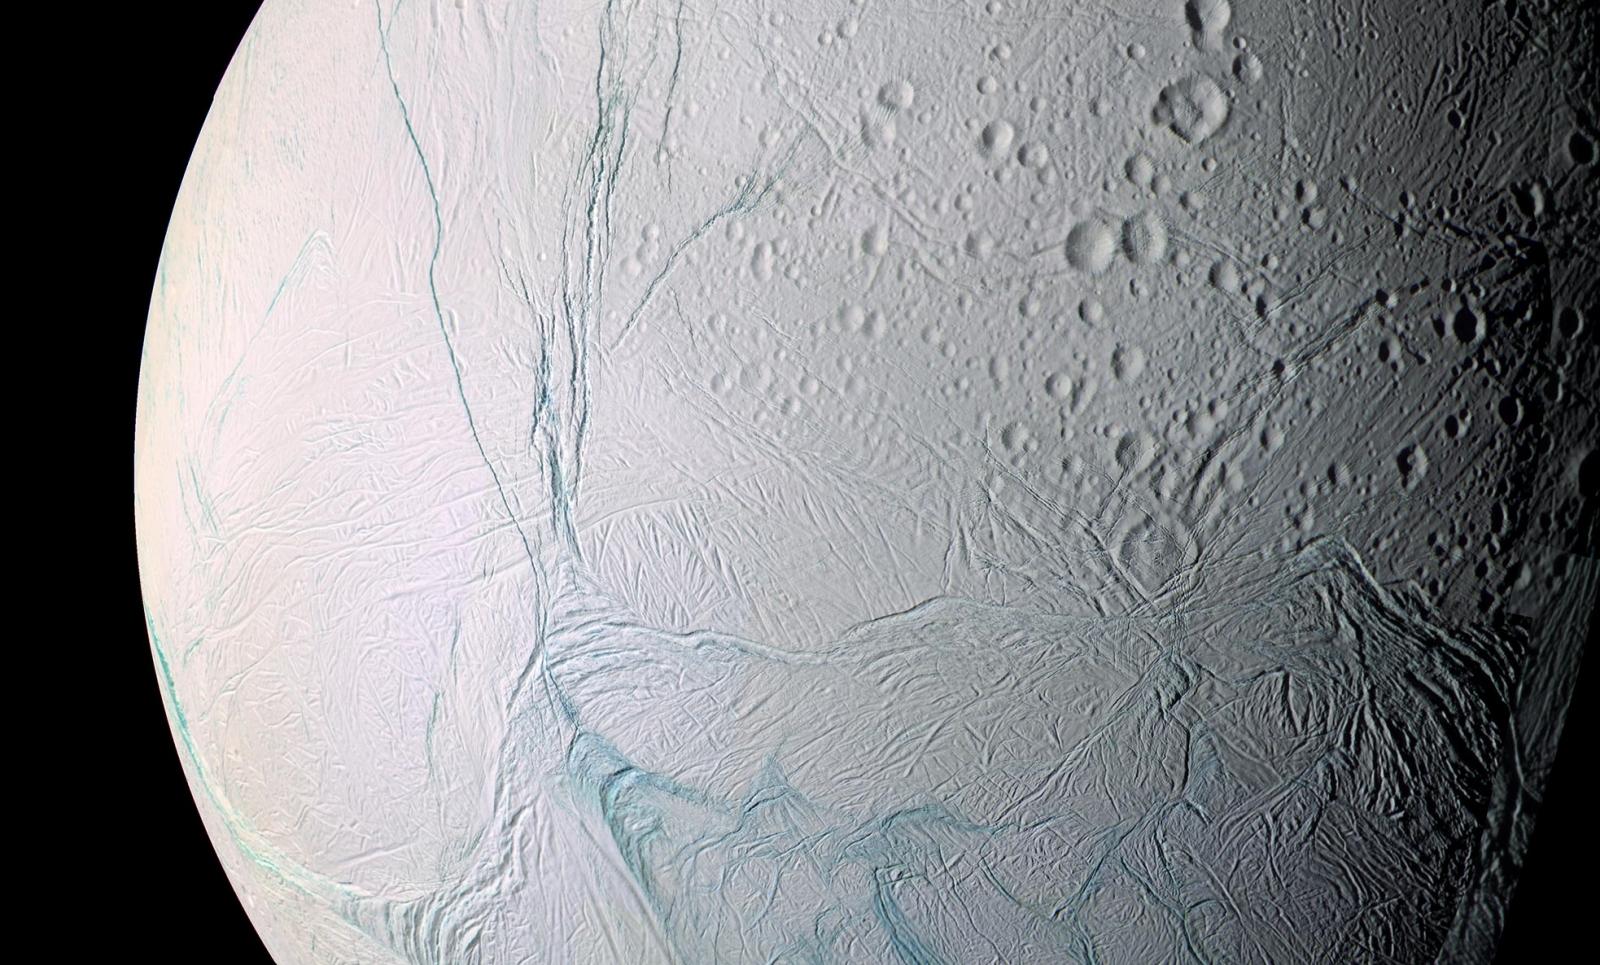 Planeta Saturn viata